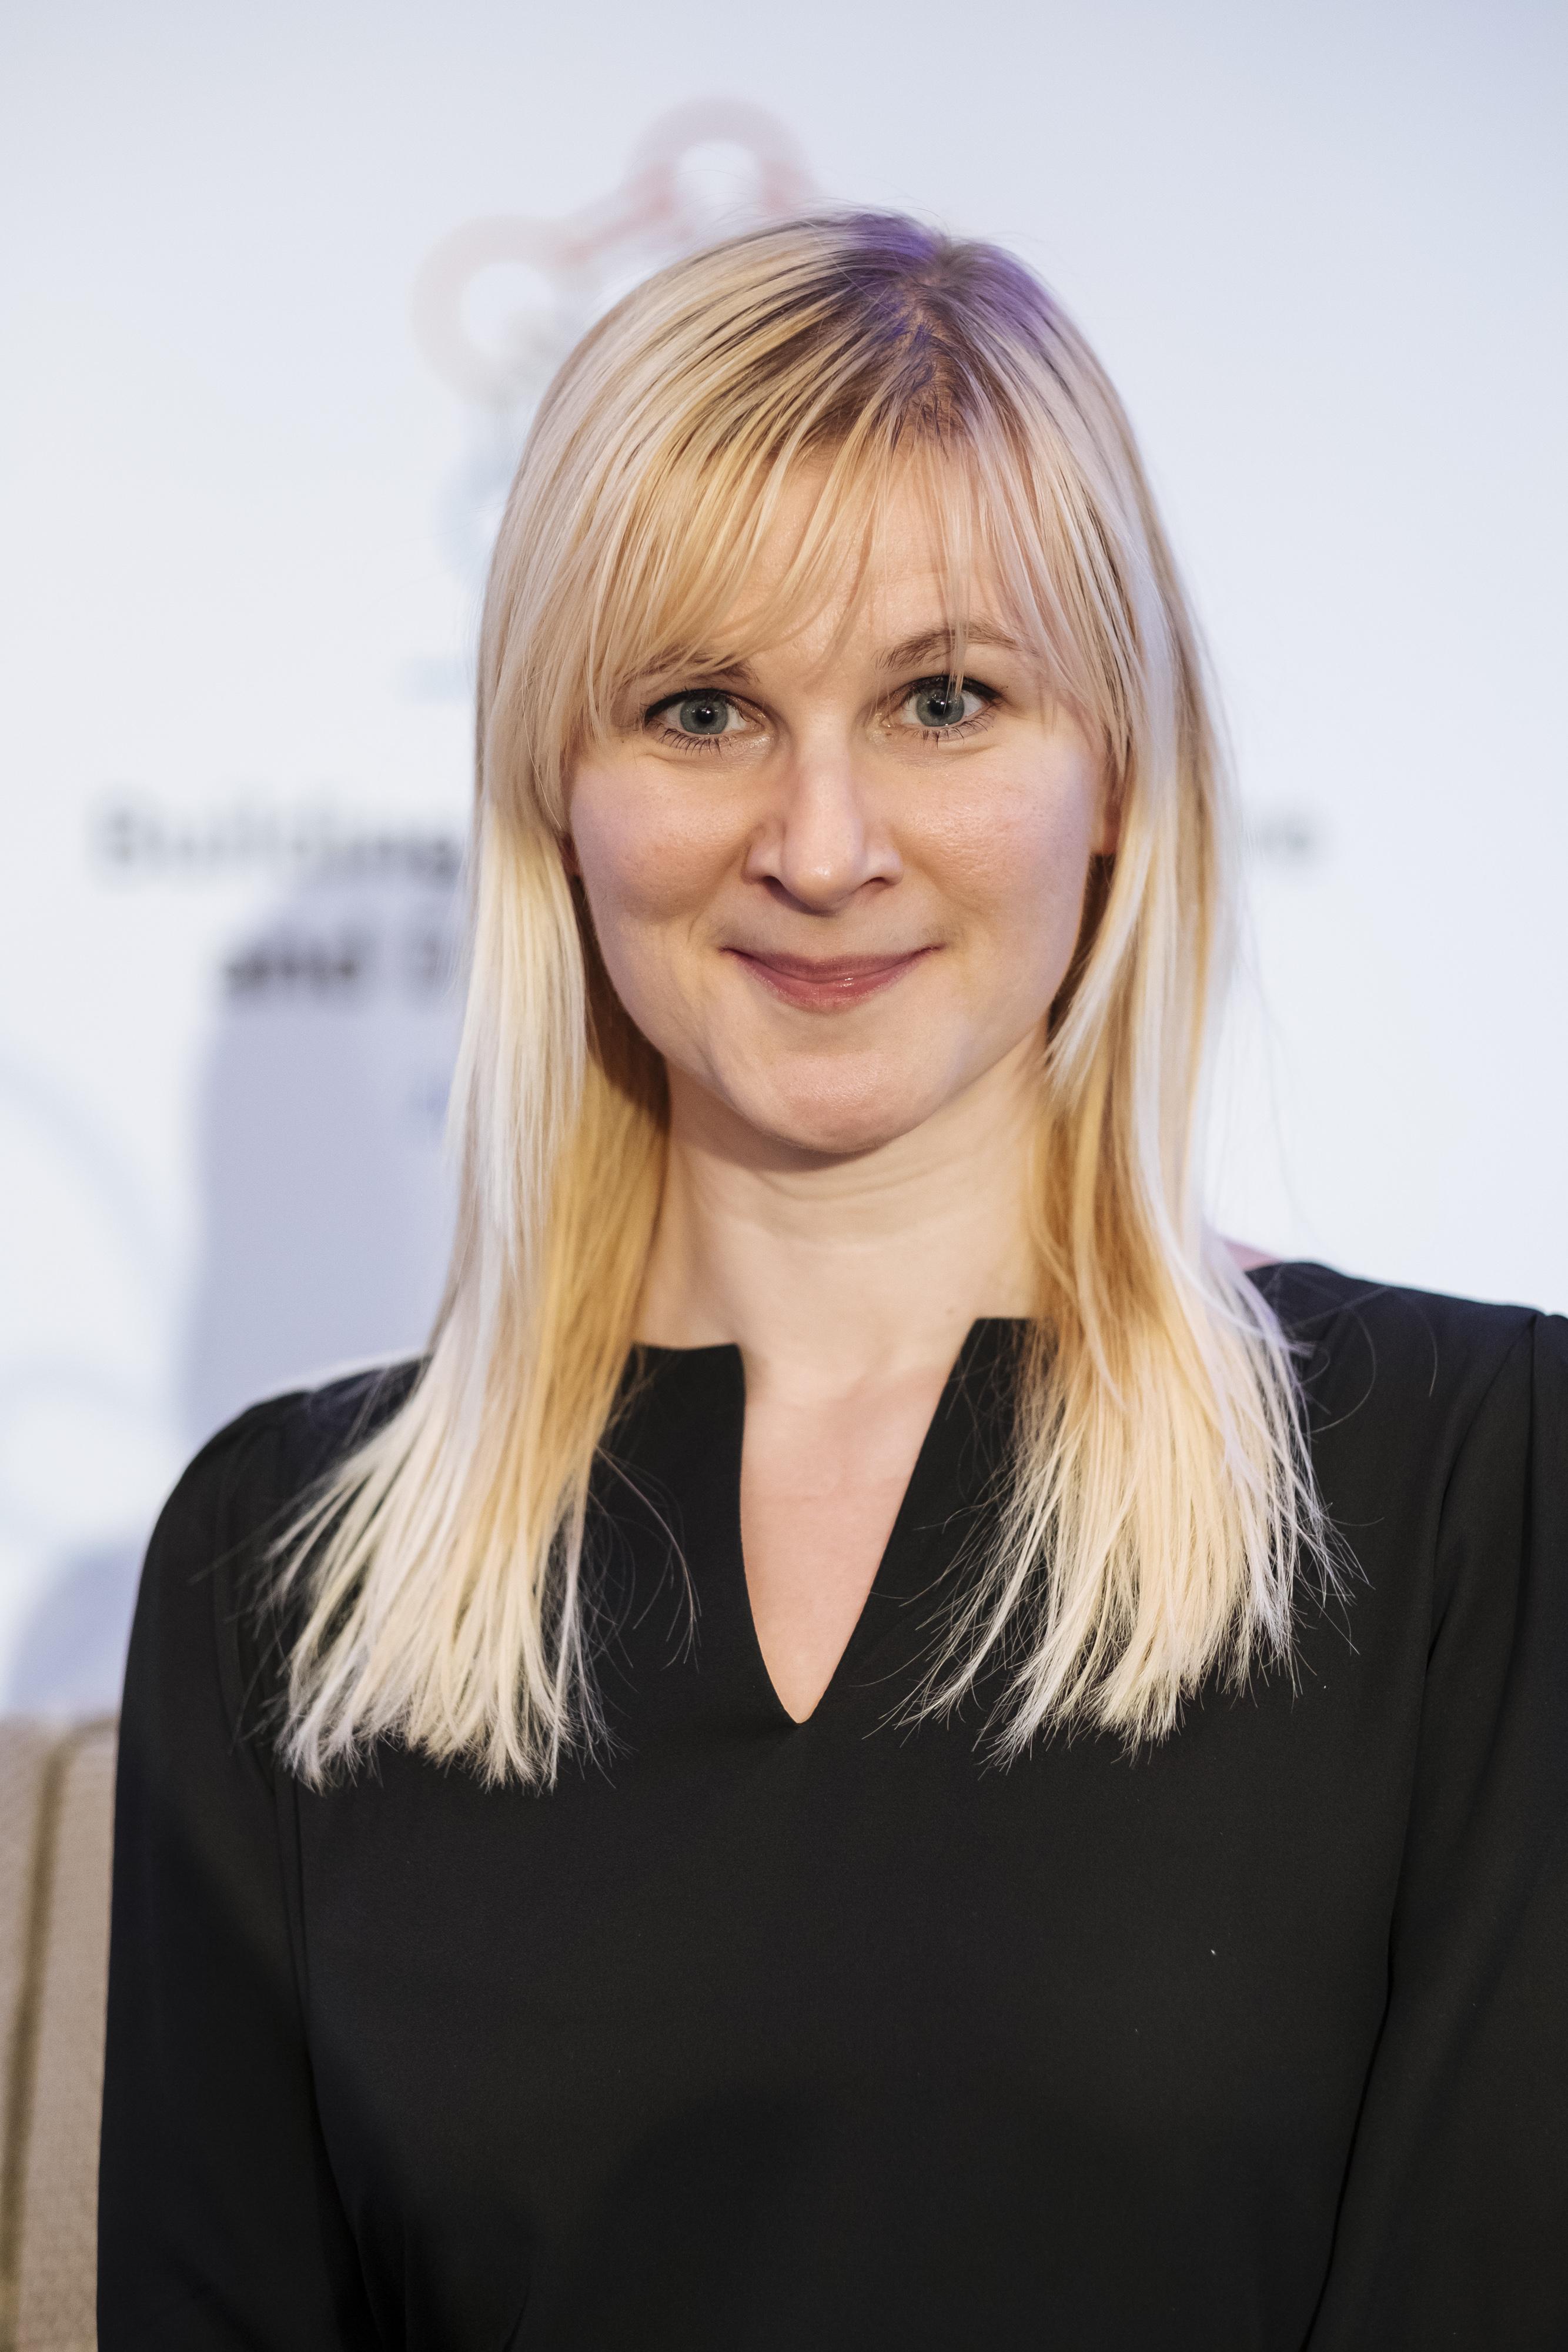 Lidia Gromadzka